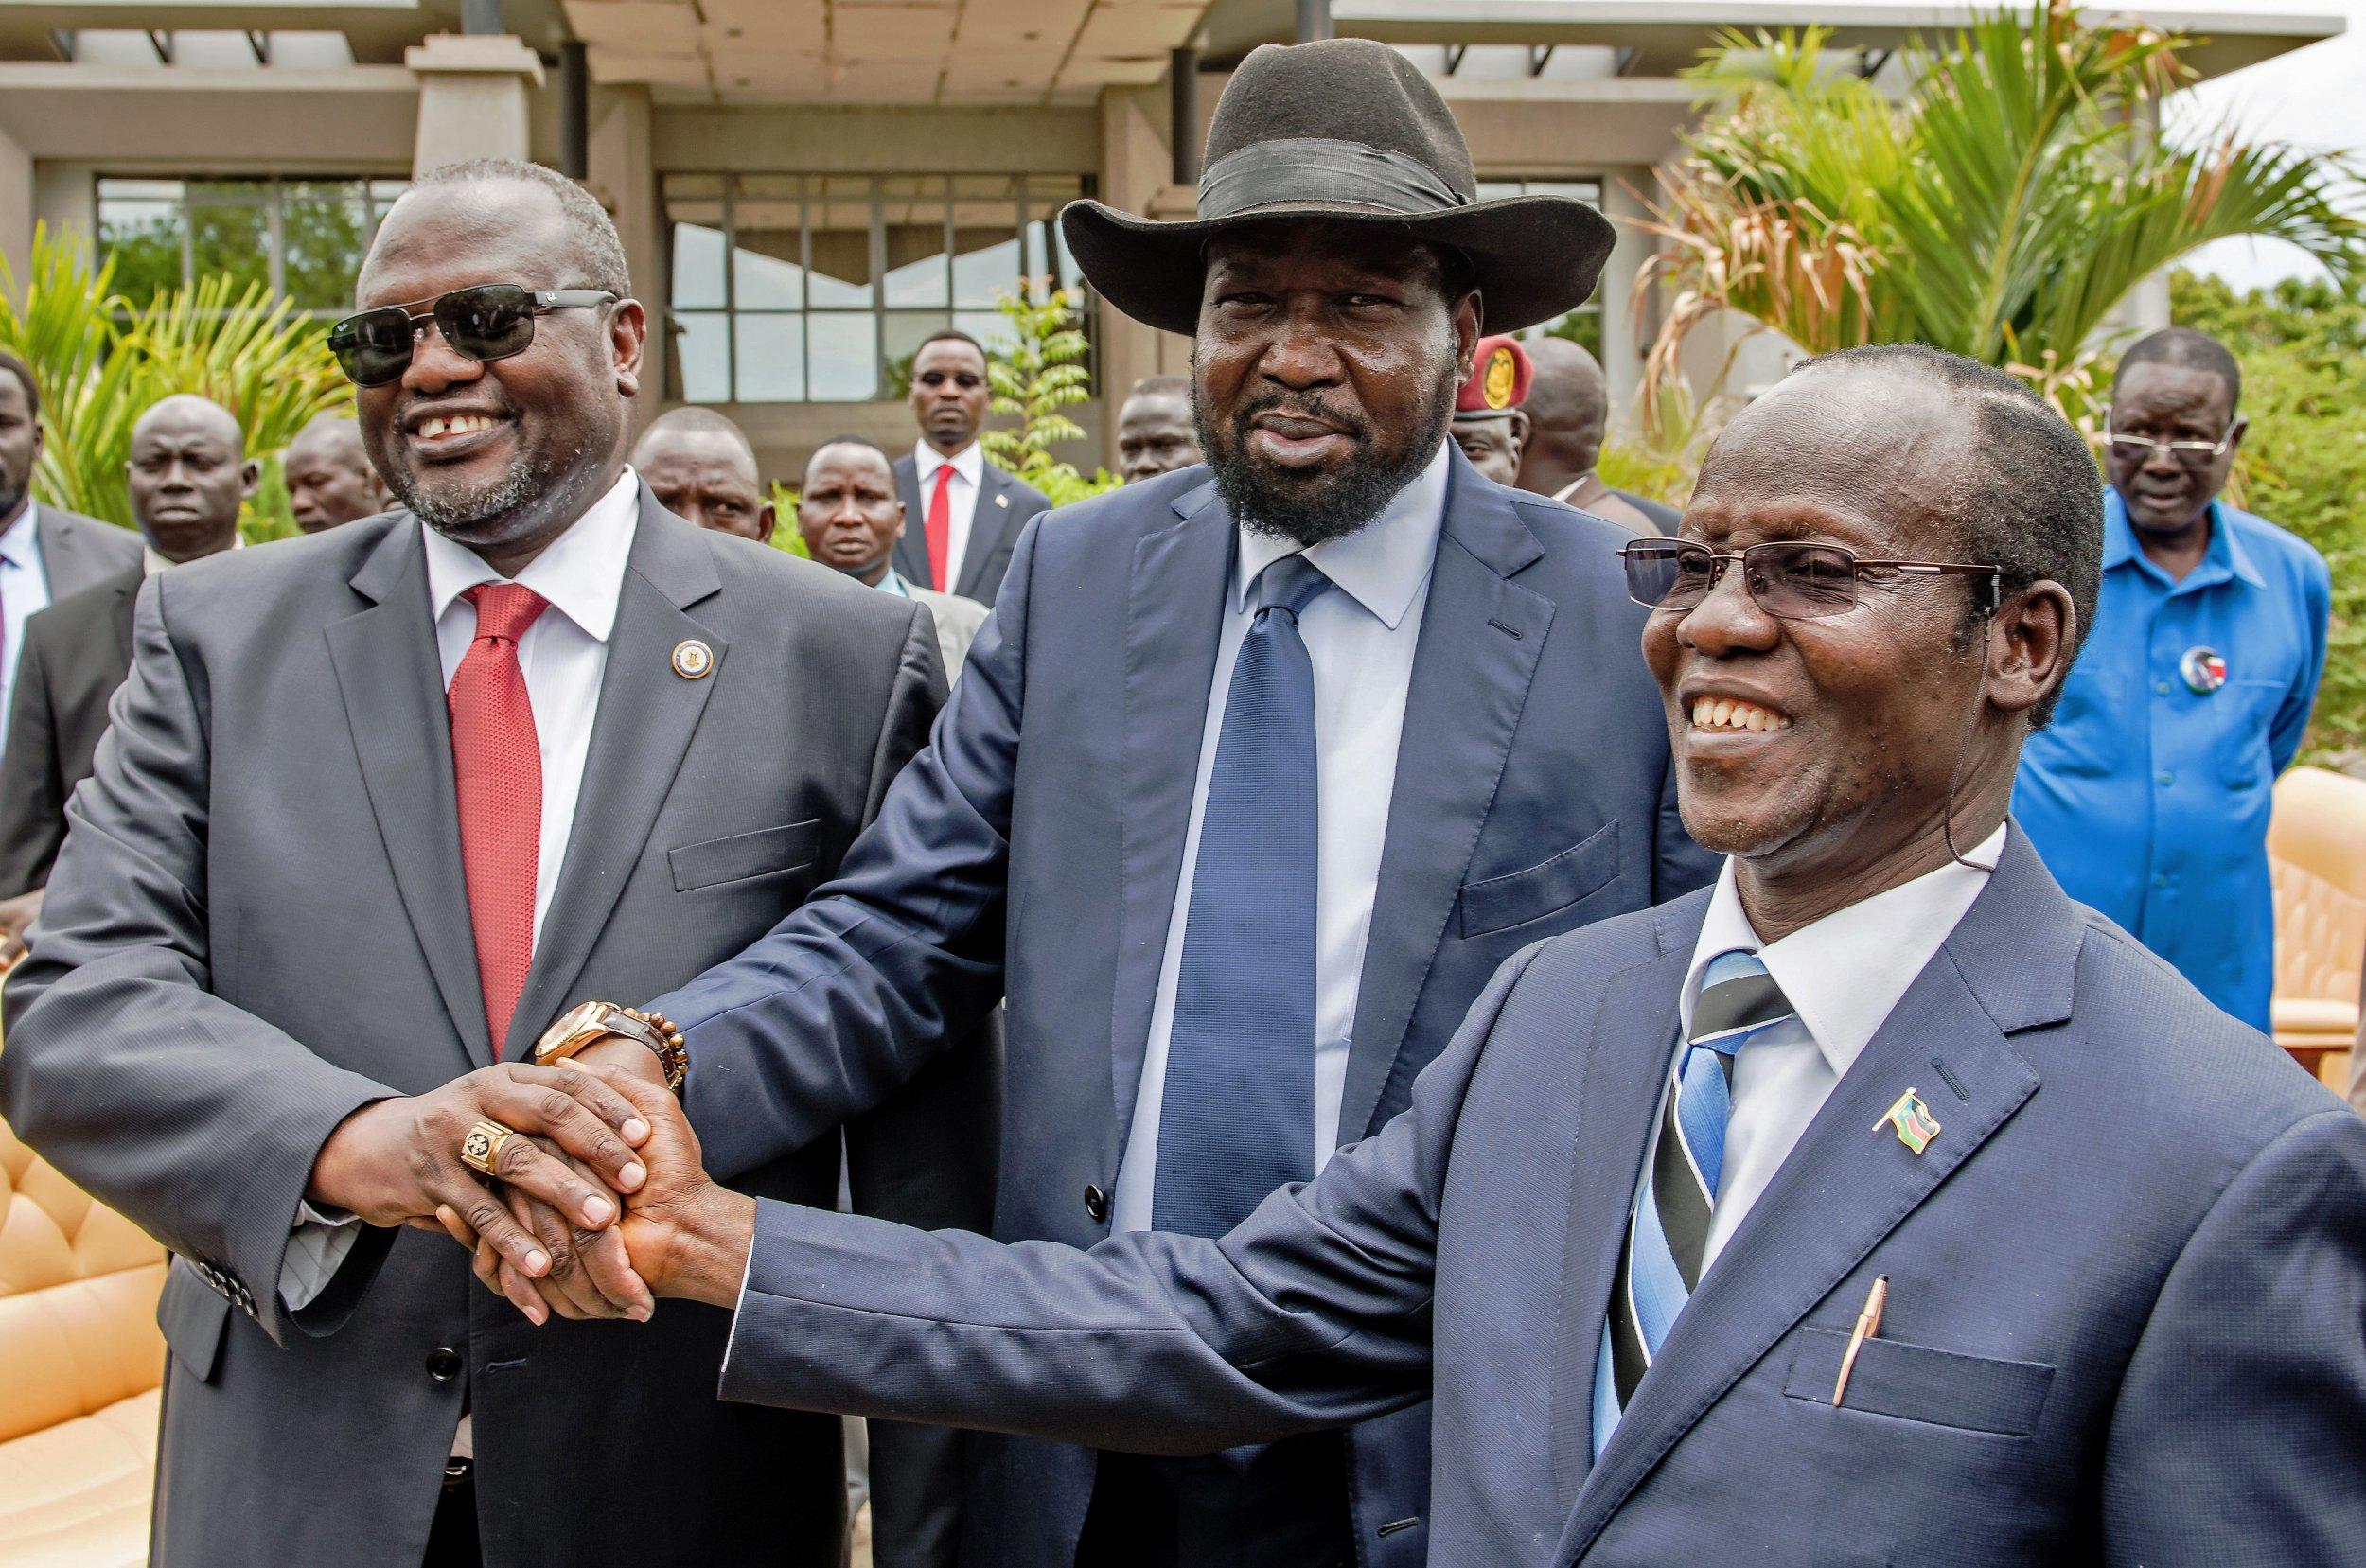 Riek Machar, Salva Kiir and James Wani Igga